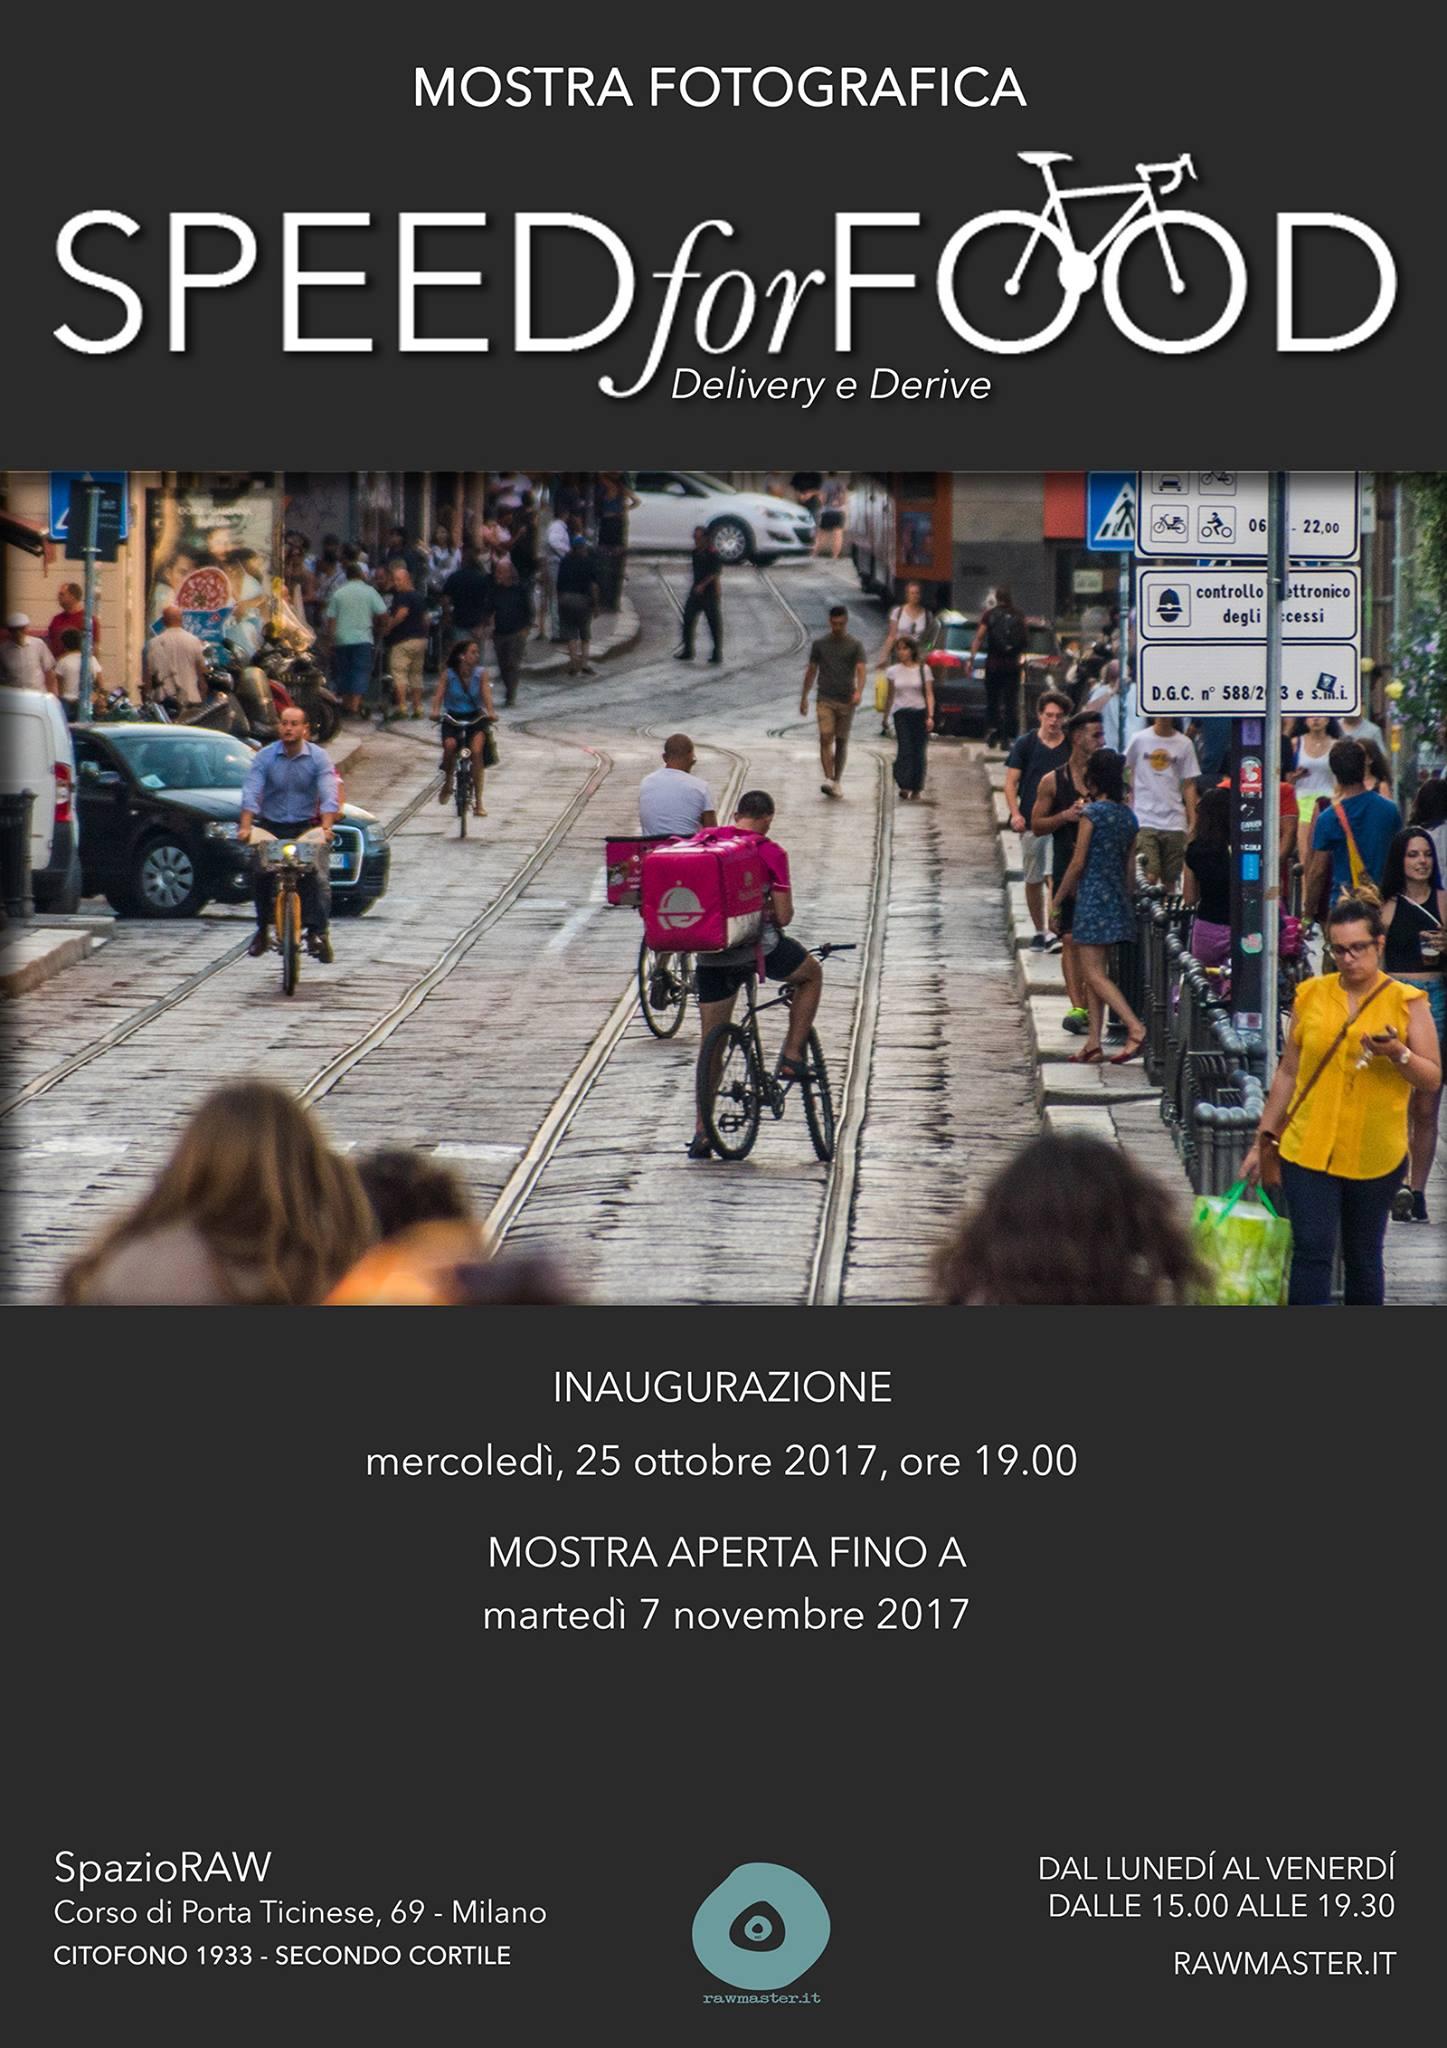 SpeedforFood mostra fotografica in spazioRAW Milano